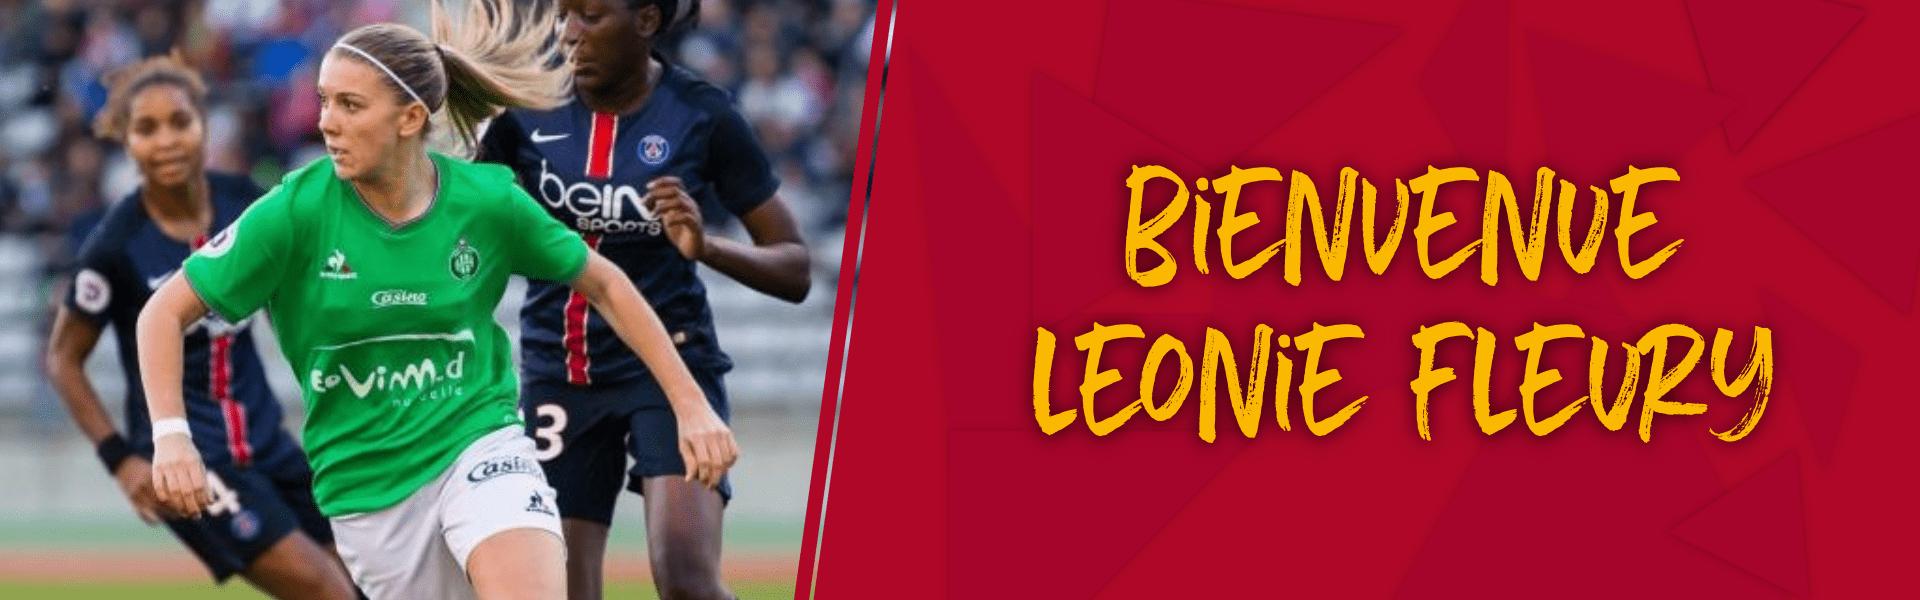 Léonie-Fleury-bandeau